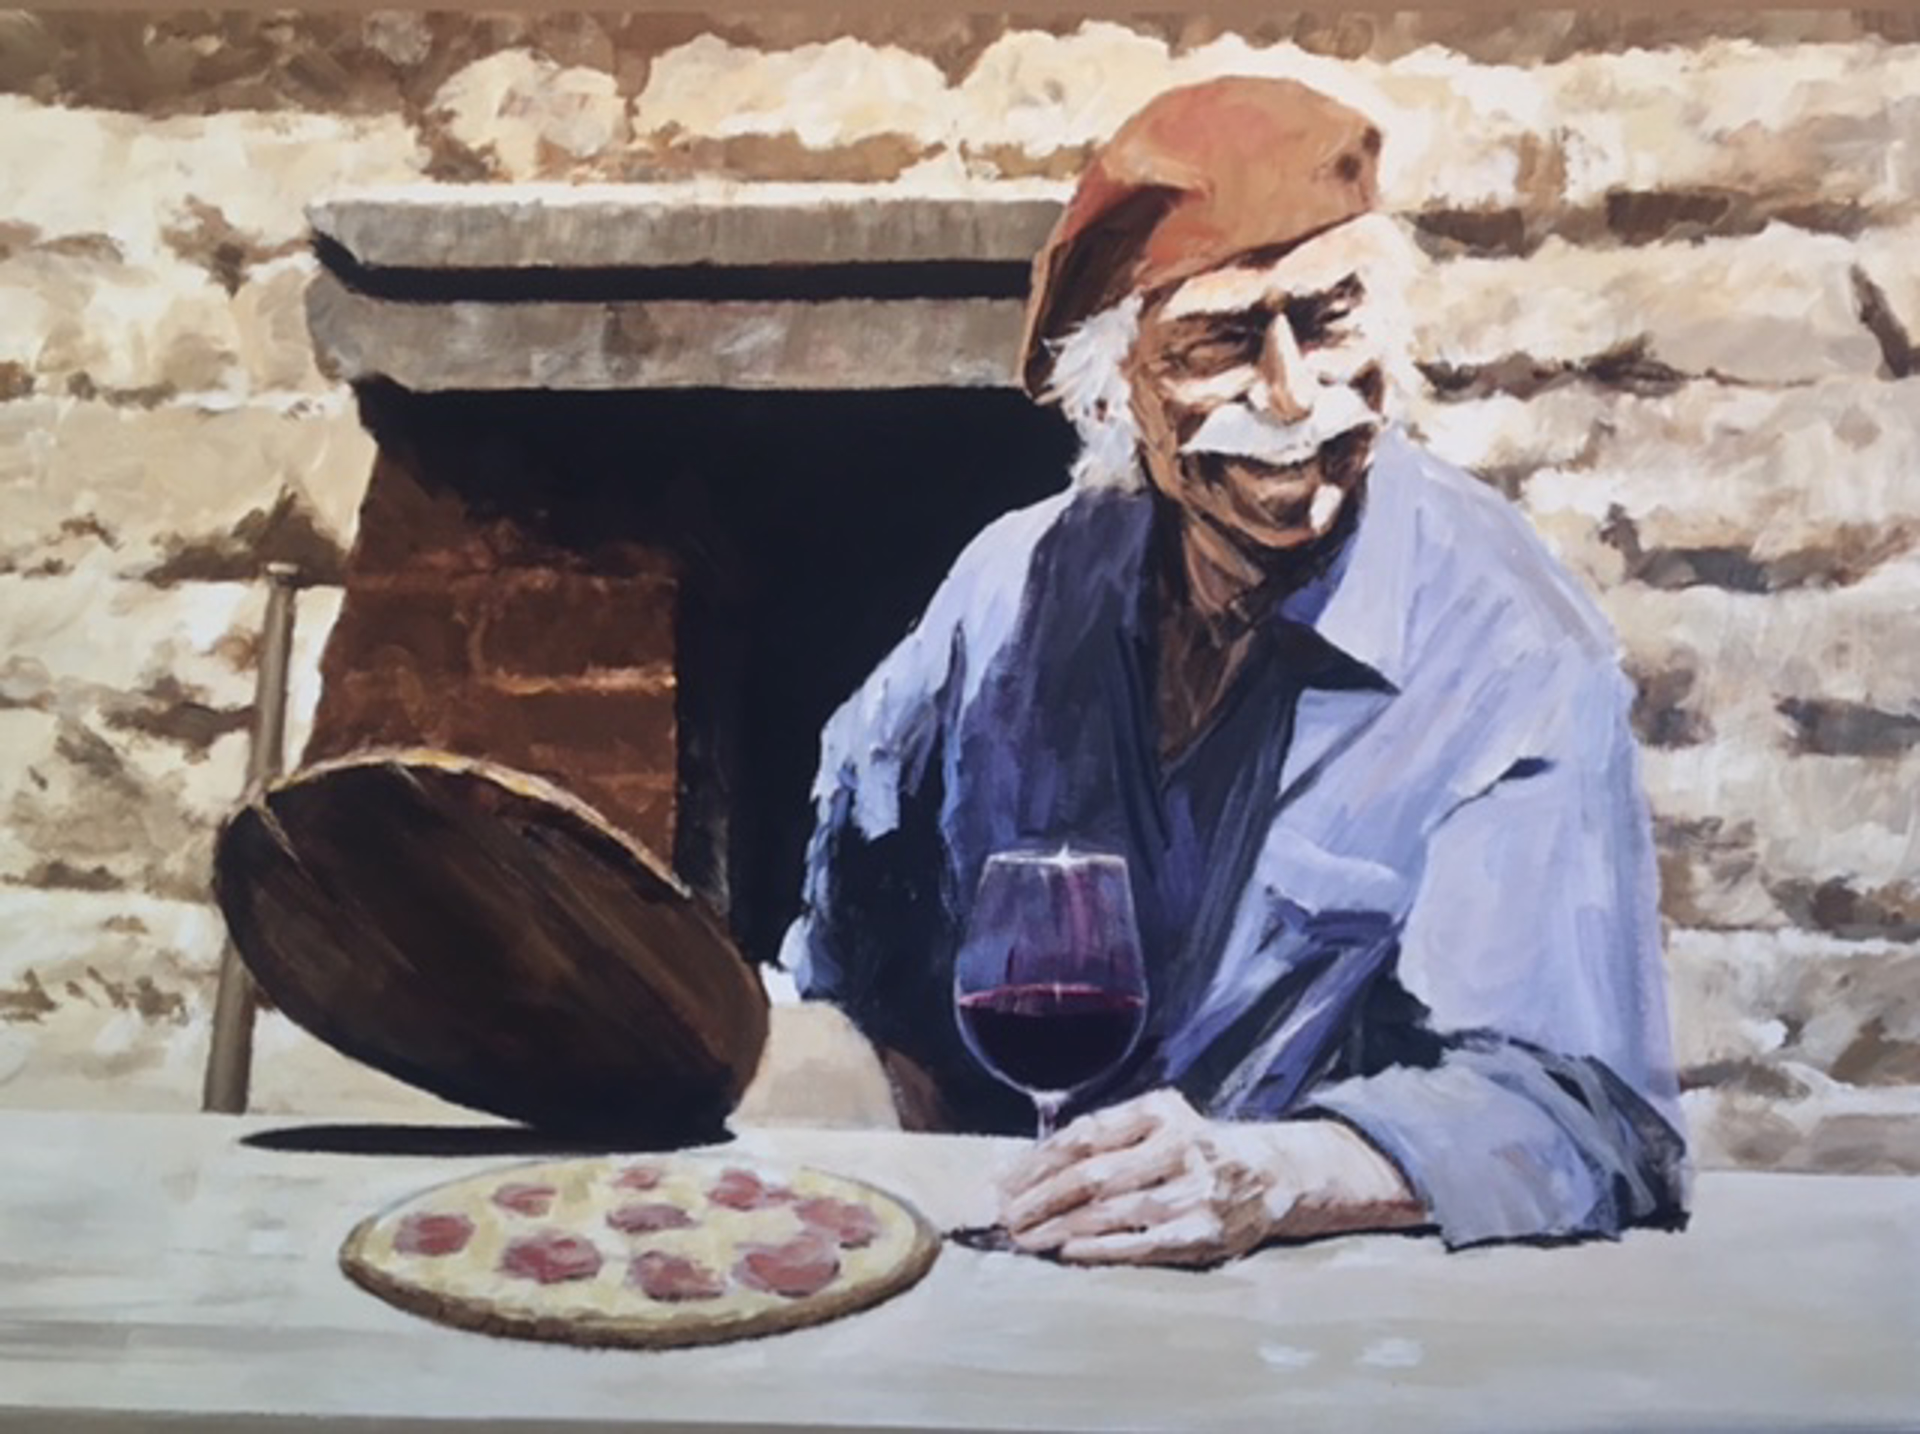 Pizza Alfresco by Aldo Luongo